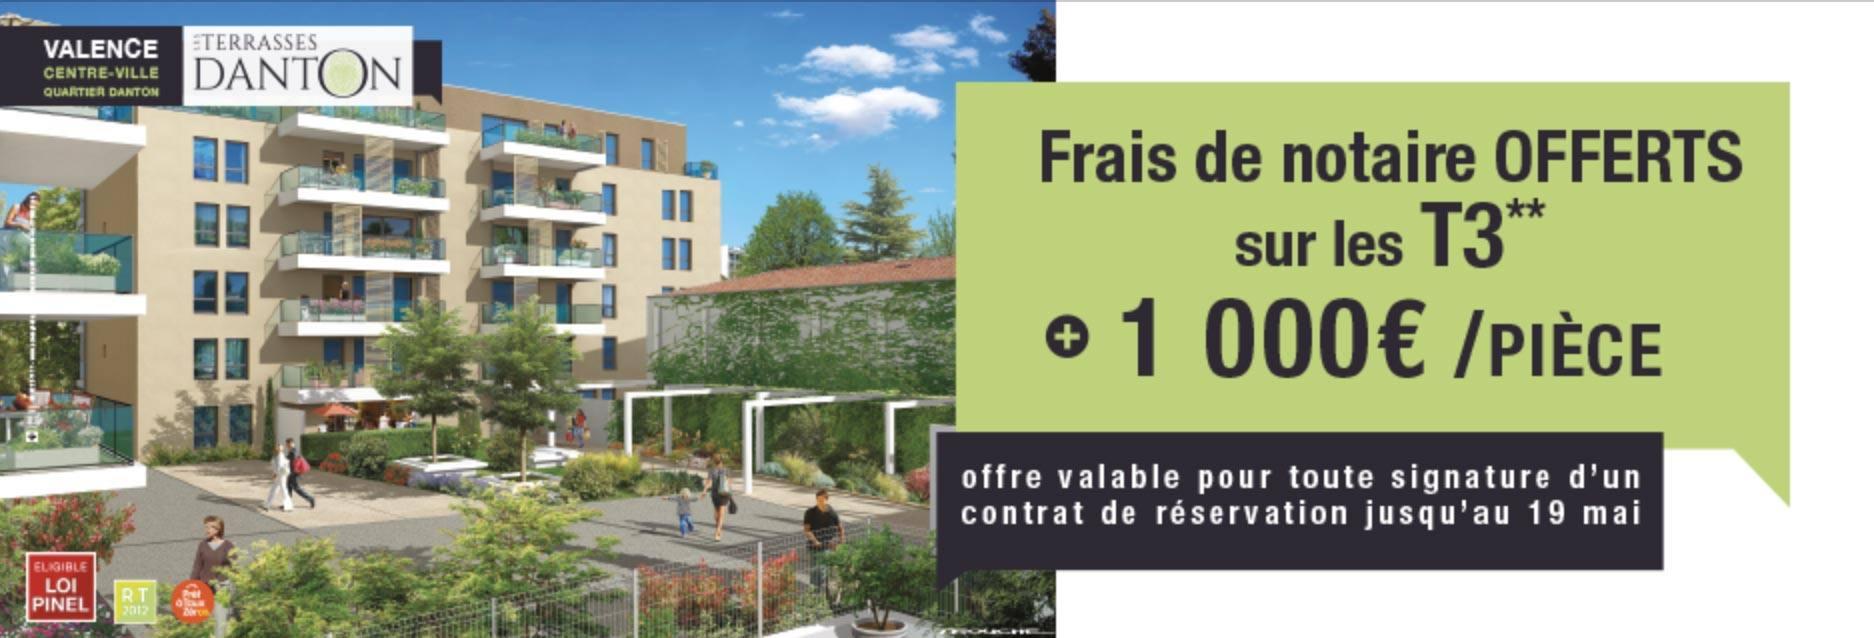 Offre Valence Terrasses Danton Art Promotion